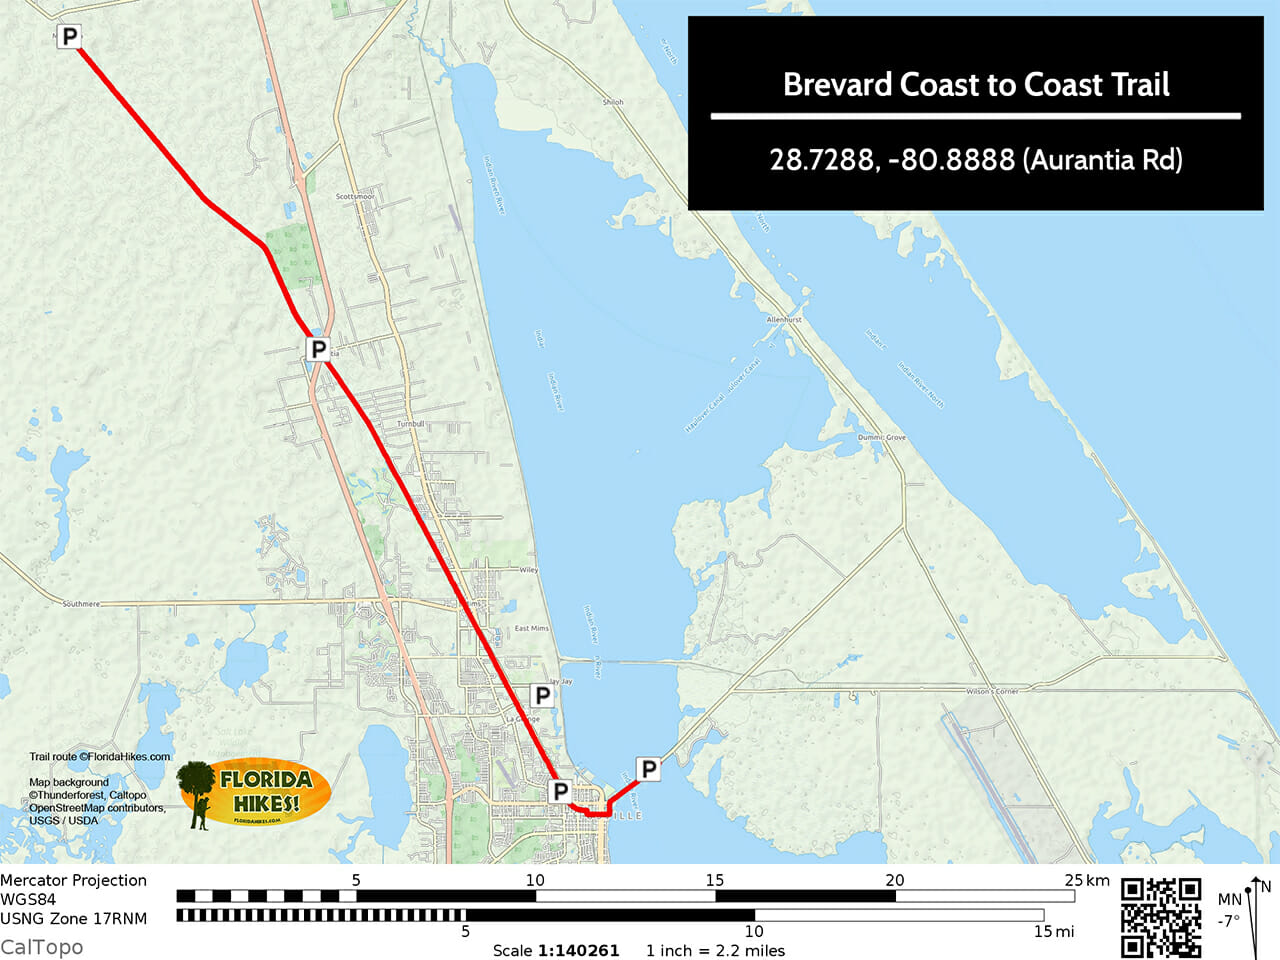 Brevard Coast to Coast Trail map